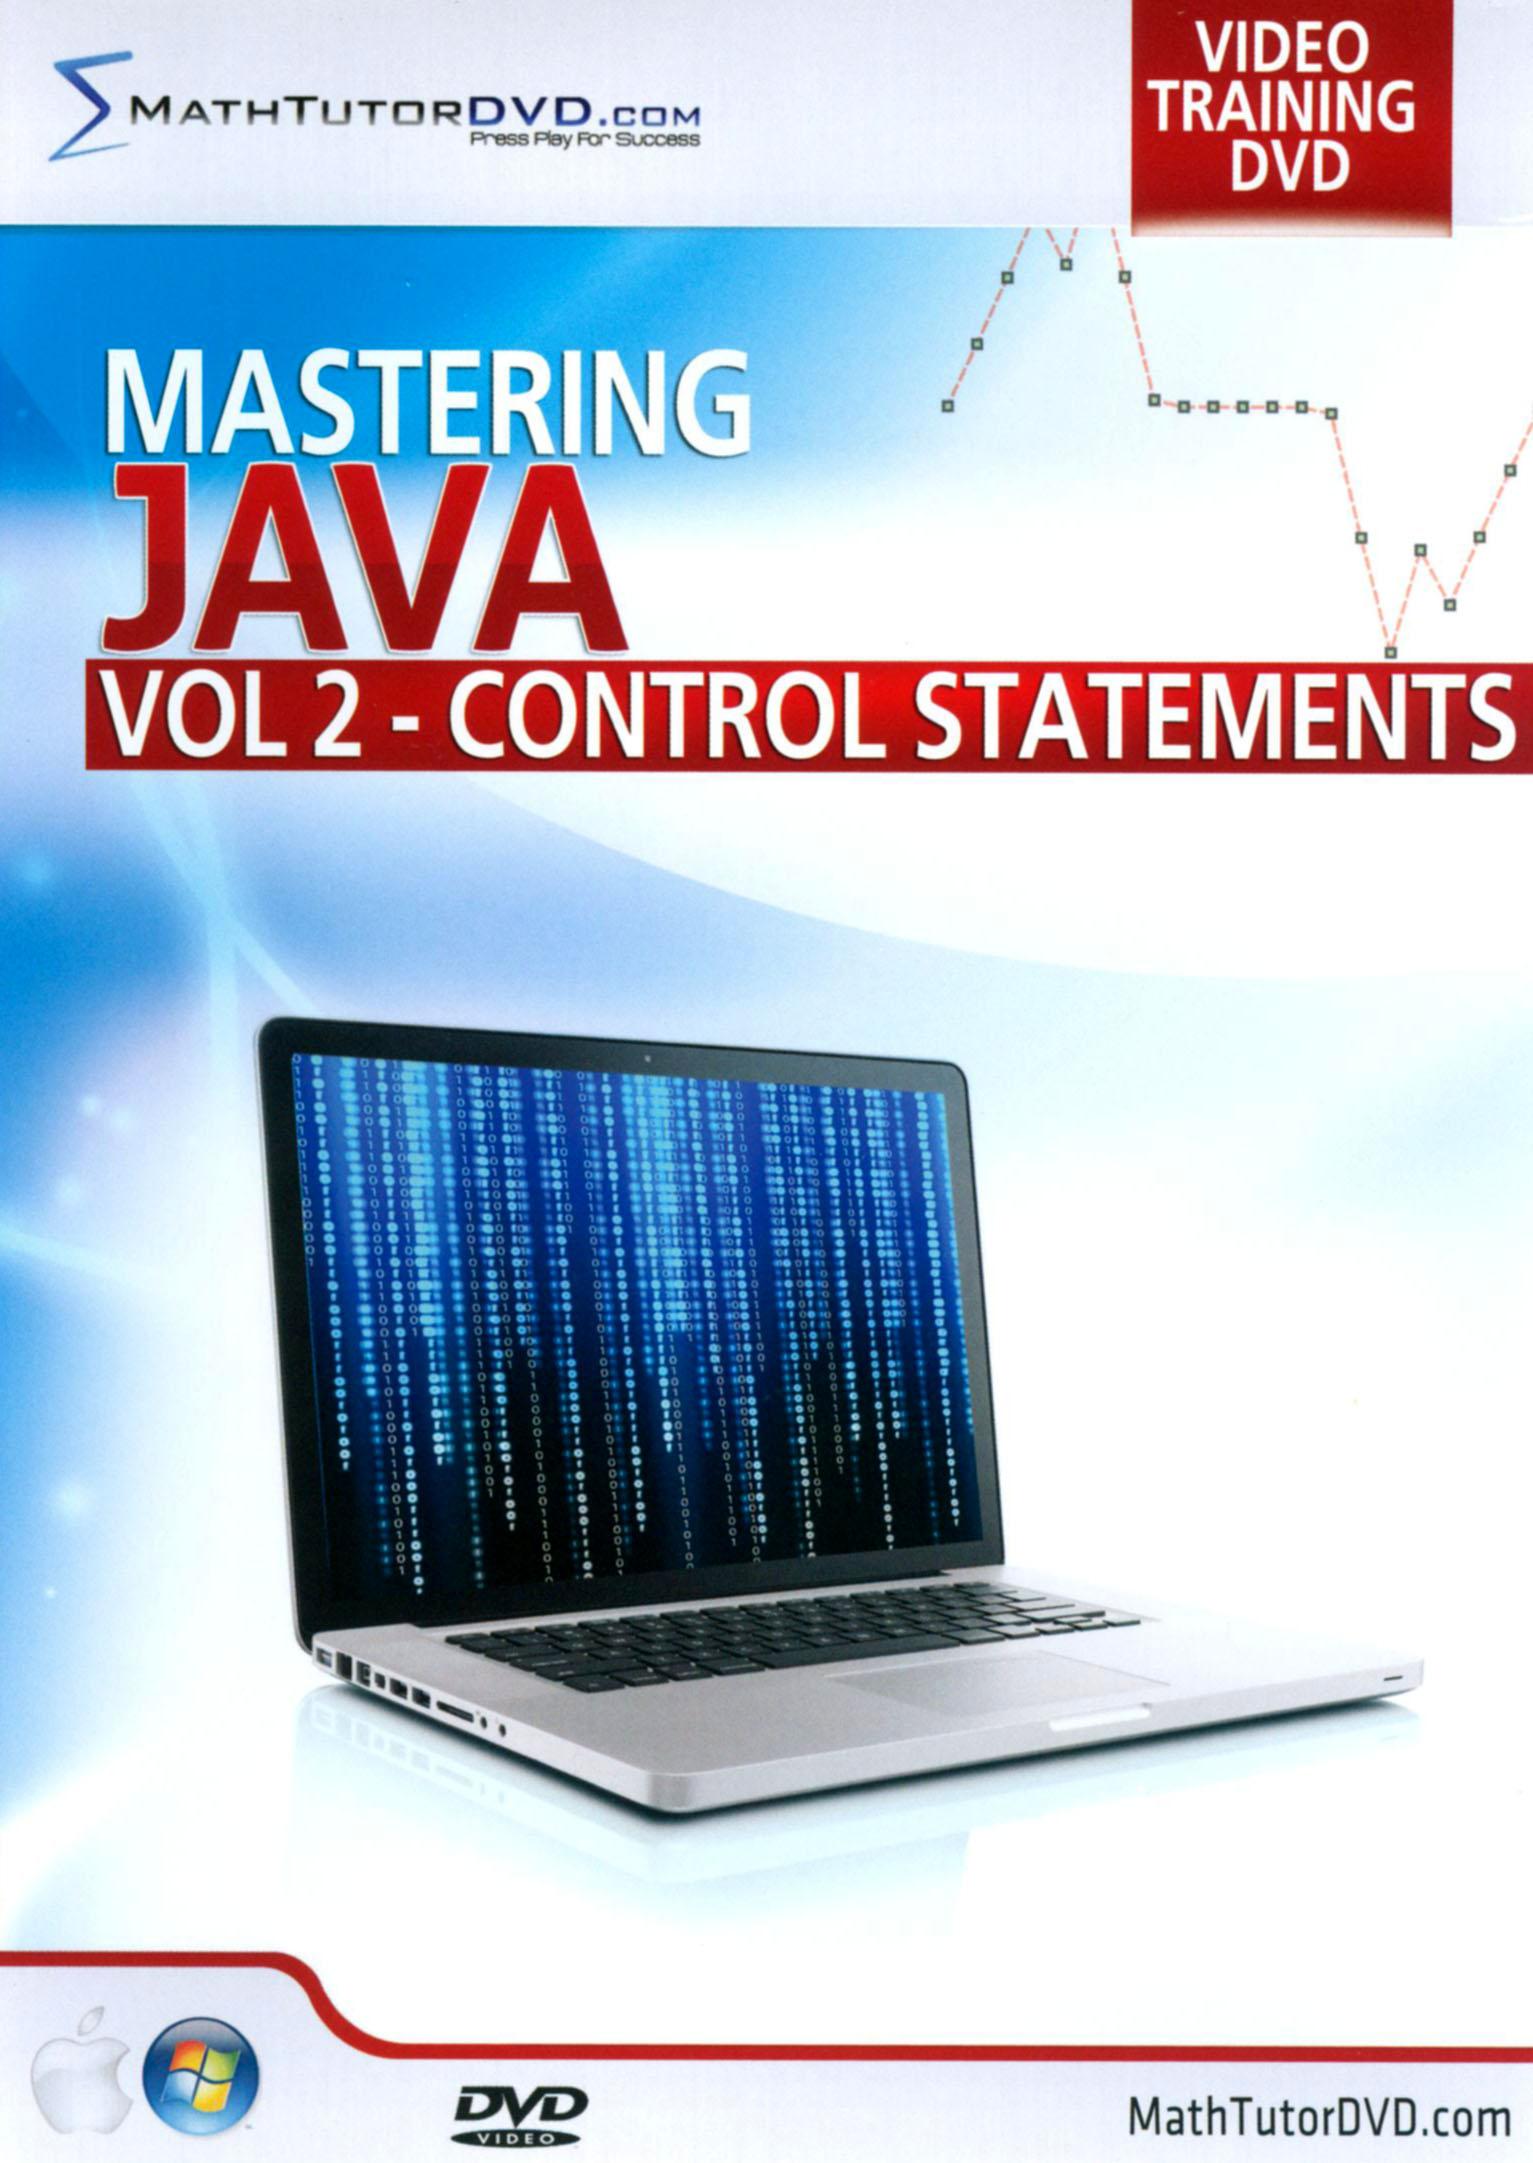 Mastering Java, Vol. 2: Control Statements